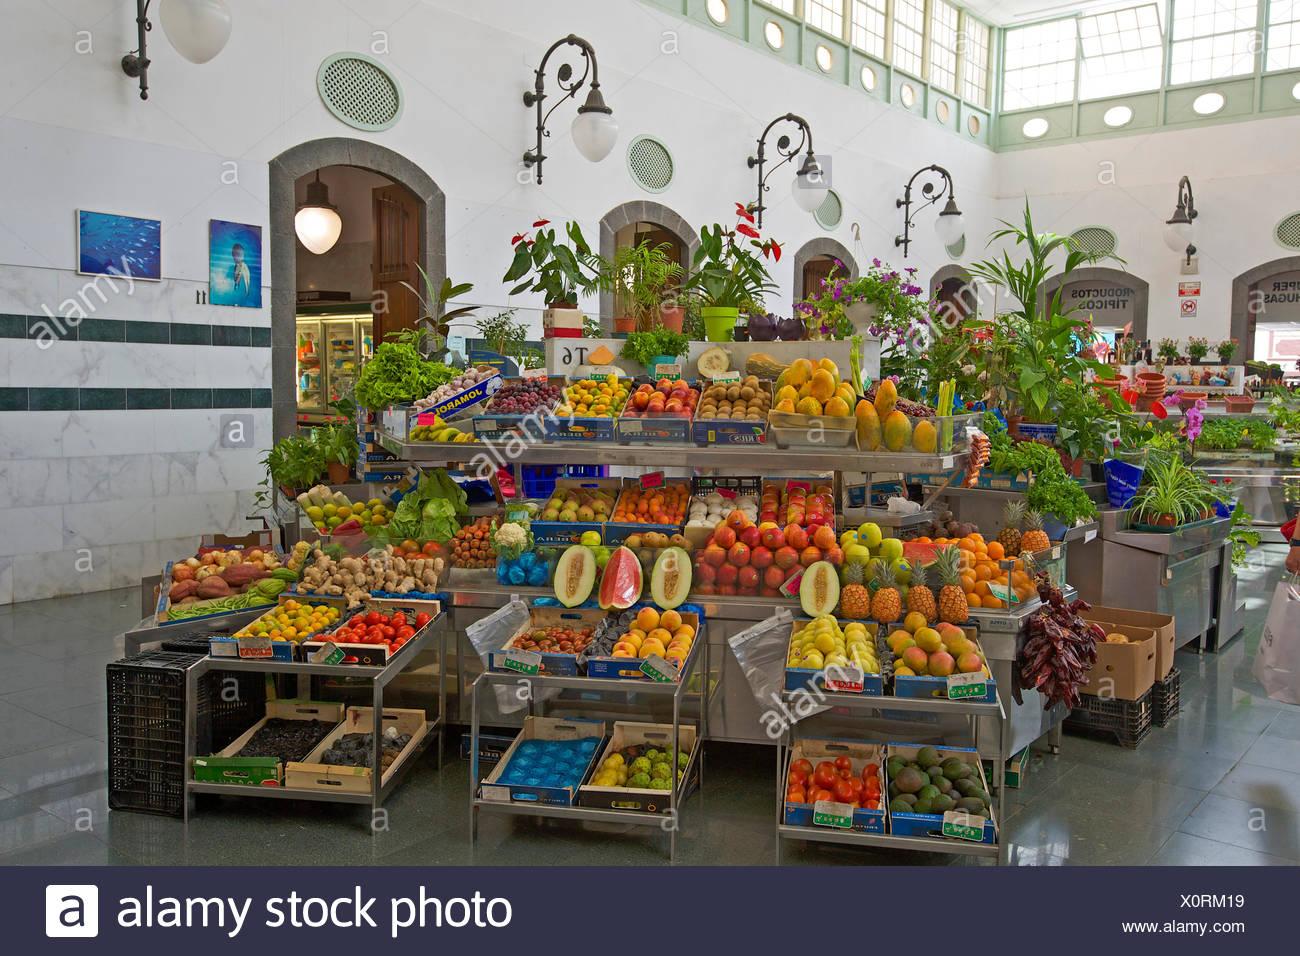 Kanaren, Kanarische Inseln, Inseln, La Palma, Spanien, Europa, Tag, niemand, bedeckt-Markt, Markt, innen, Santa Cruz De La Palma, f Stockbild